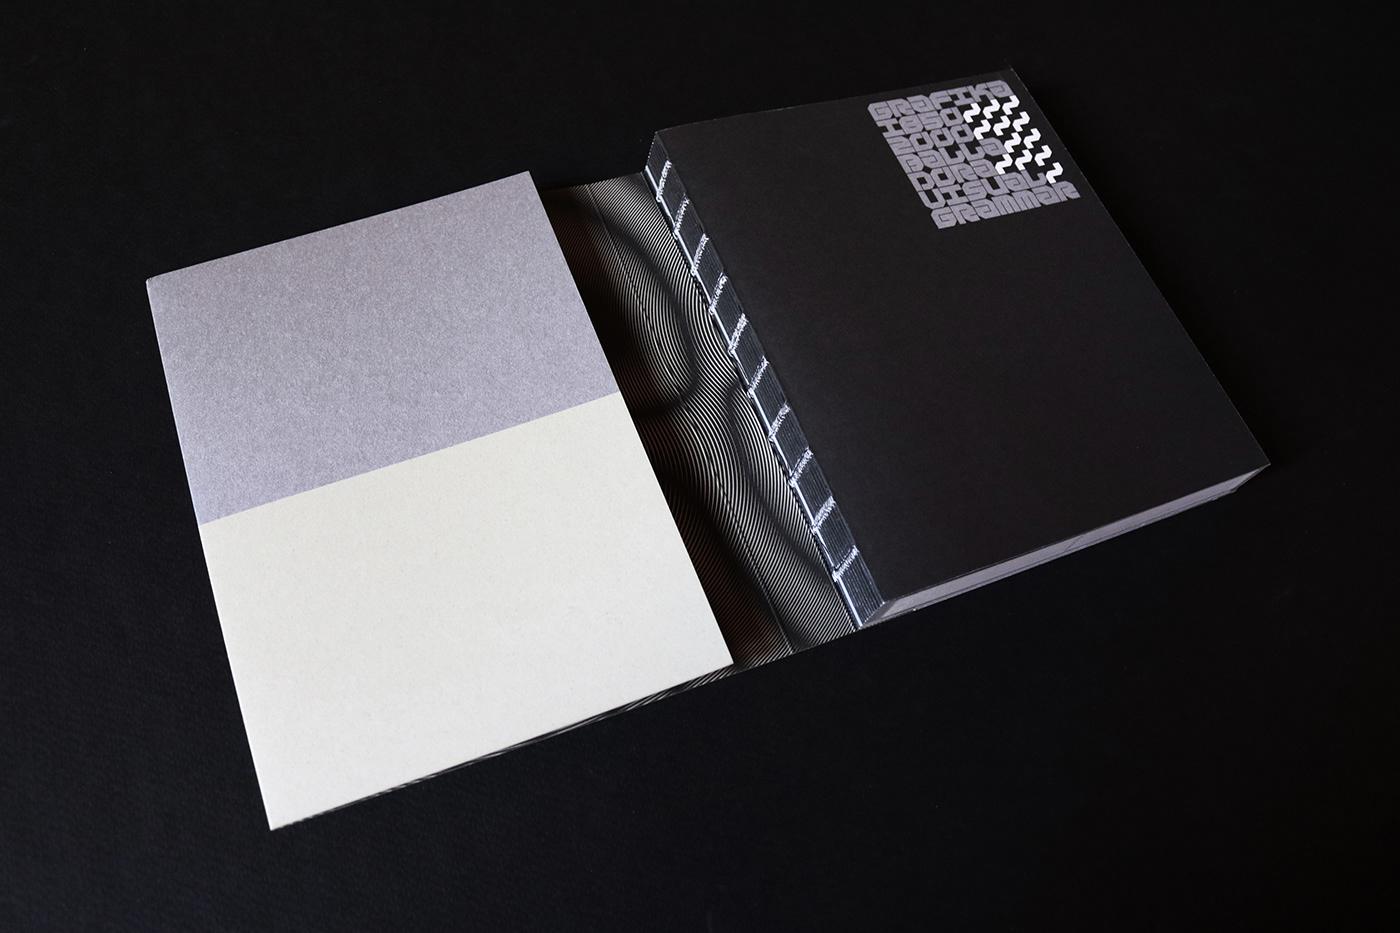 Image may contain: book, stationary and handwriting